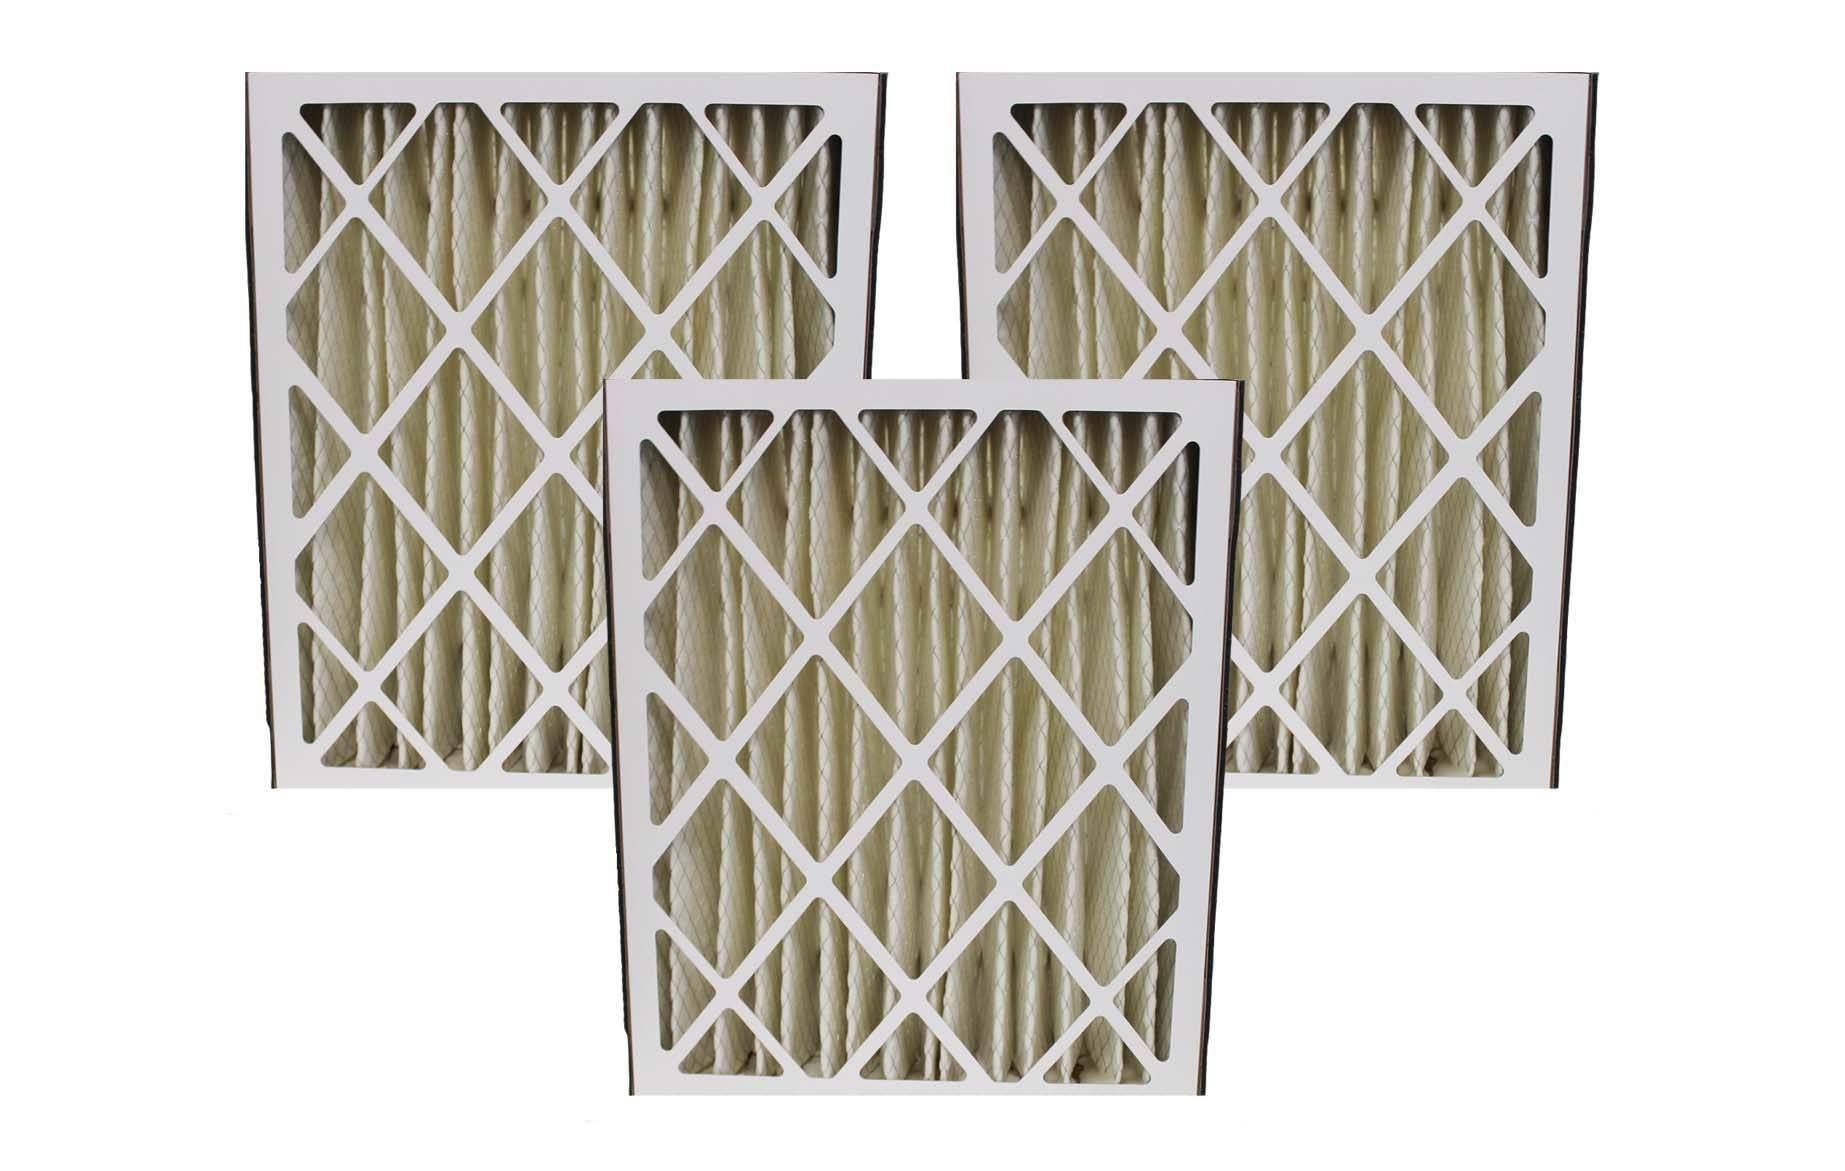 3 Trion Air Bear 20x25x5 MERV8 HVAC Furnace Filters